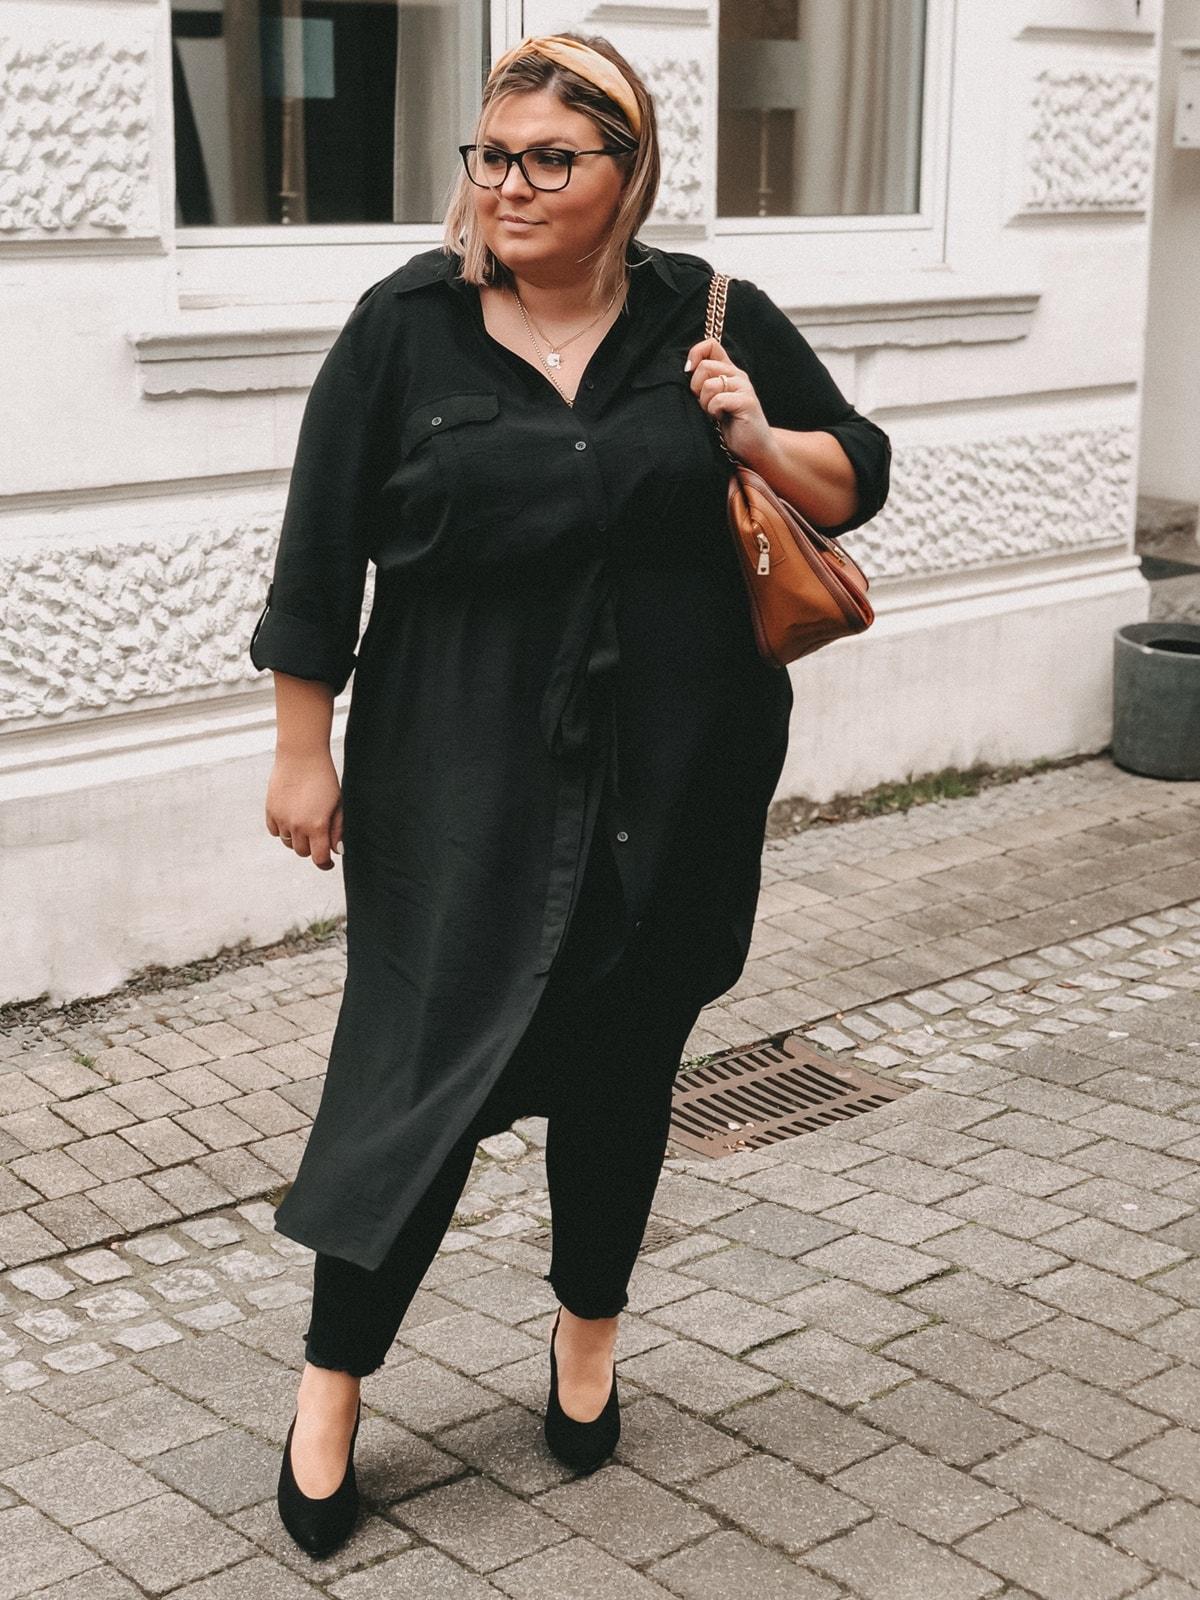 elabonbonella personal blog anna scholz by ulla popken kollektion schwarzes hemdblusenkleid 06 min